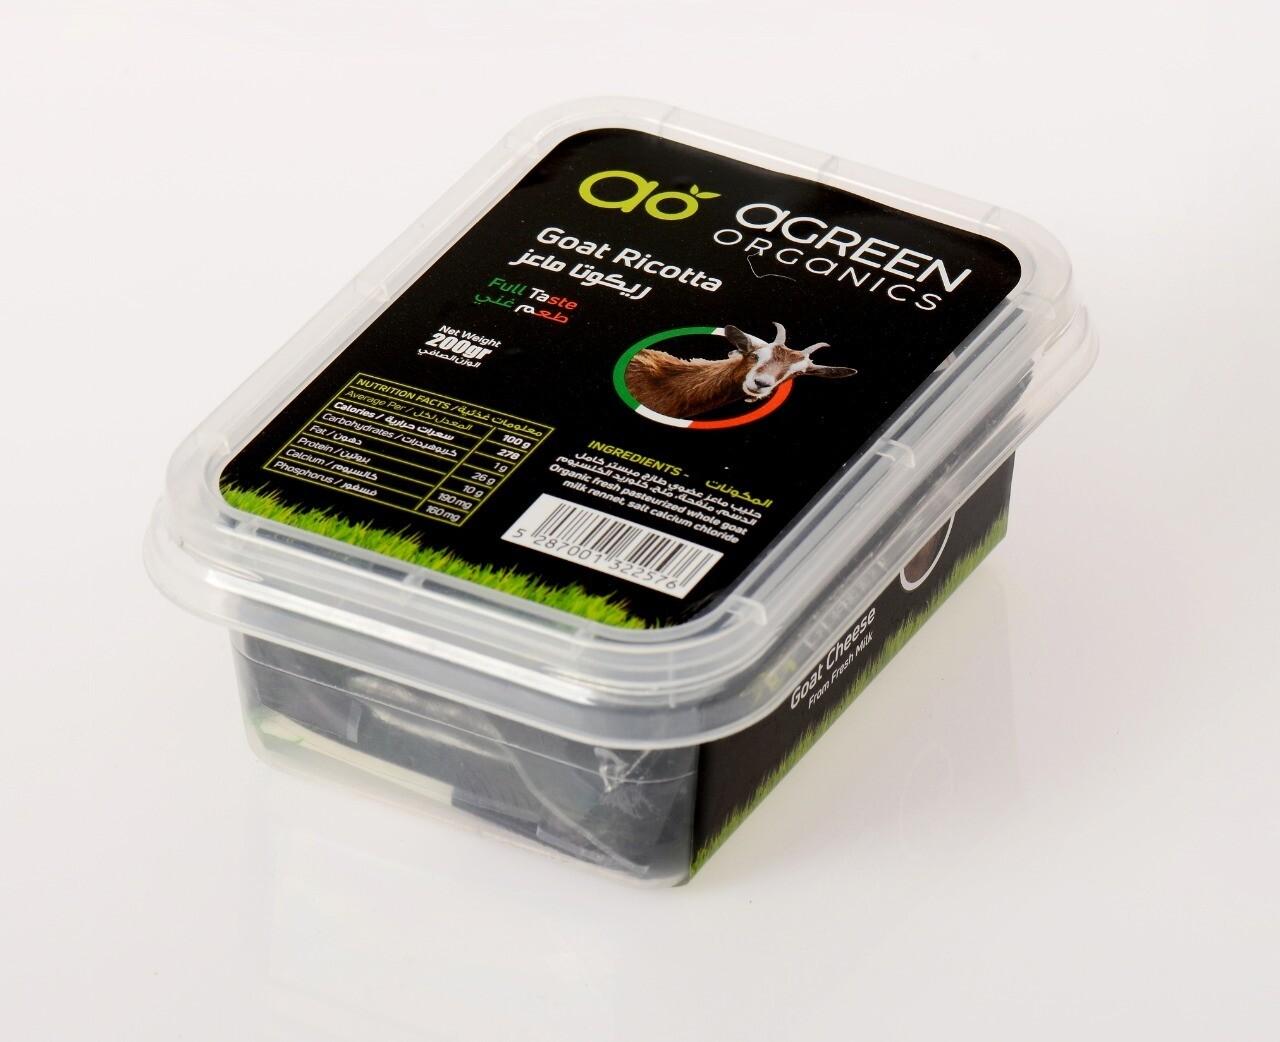 Goat Ricotta Organic الماعز ريكوتا (Pack) - Agreen Organics